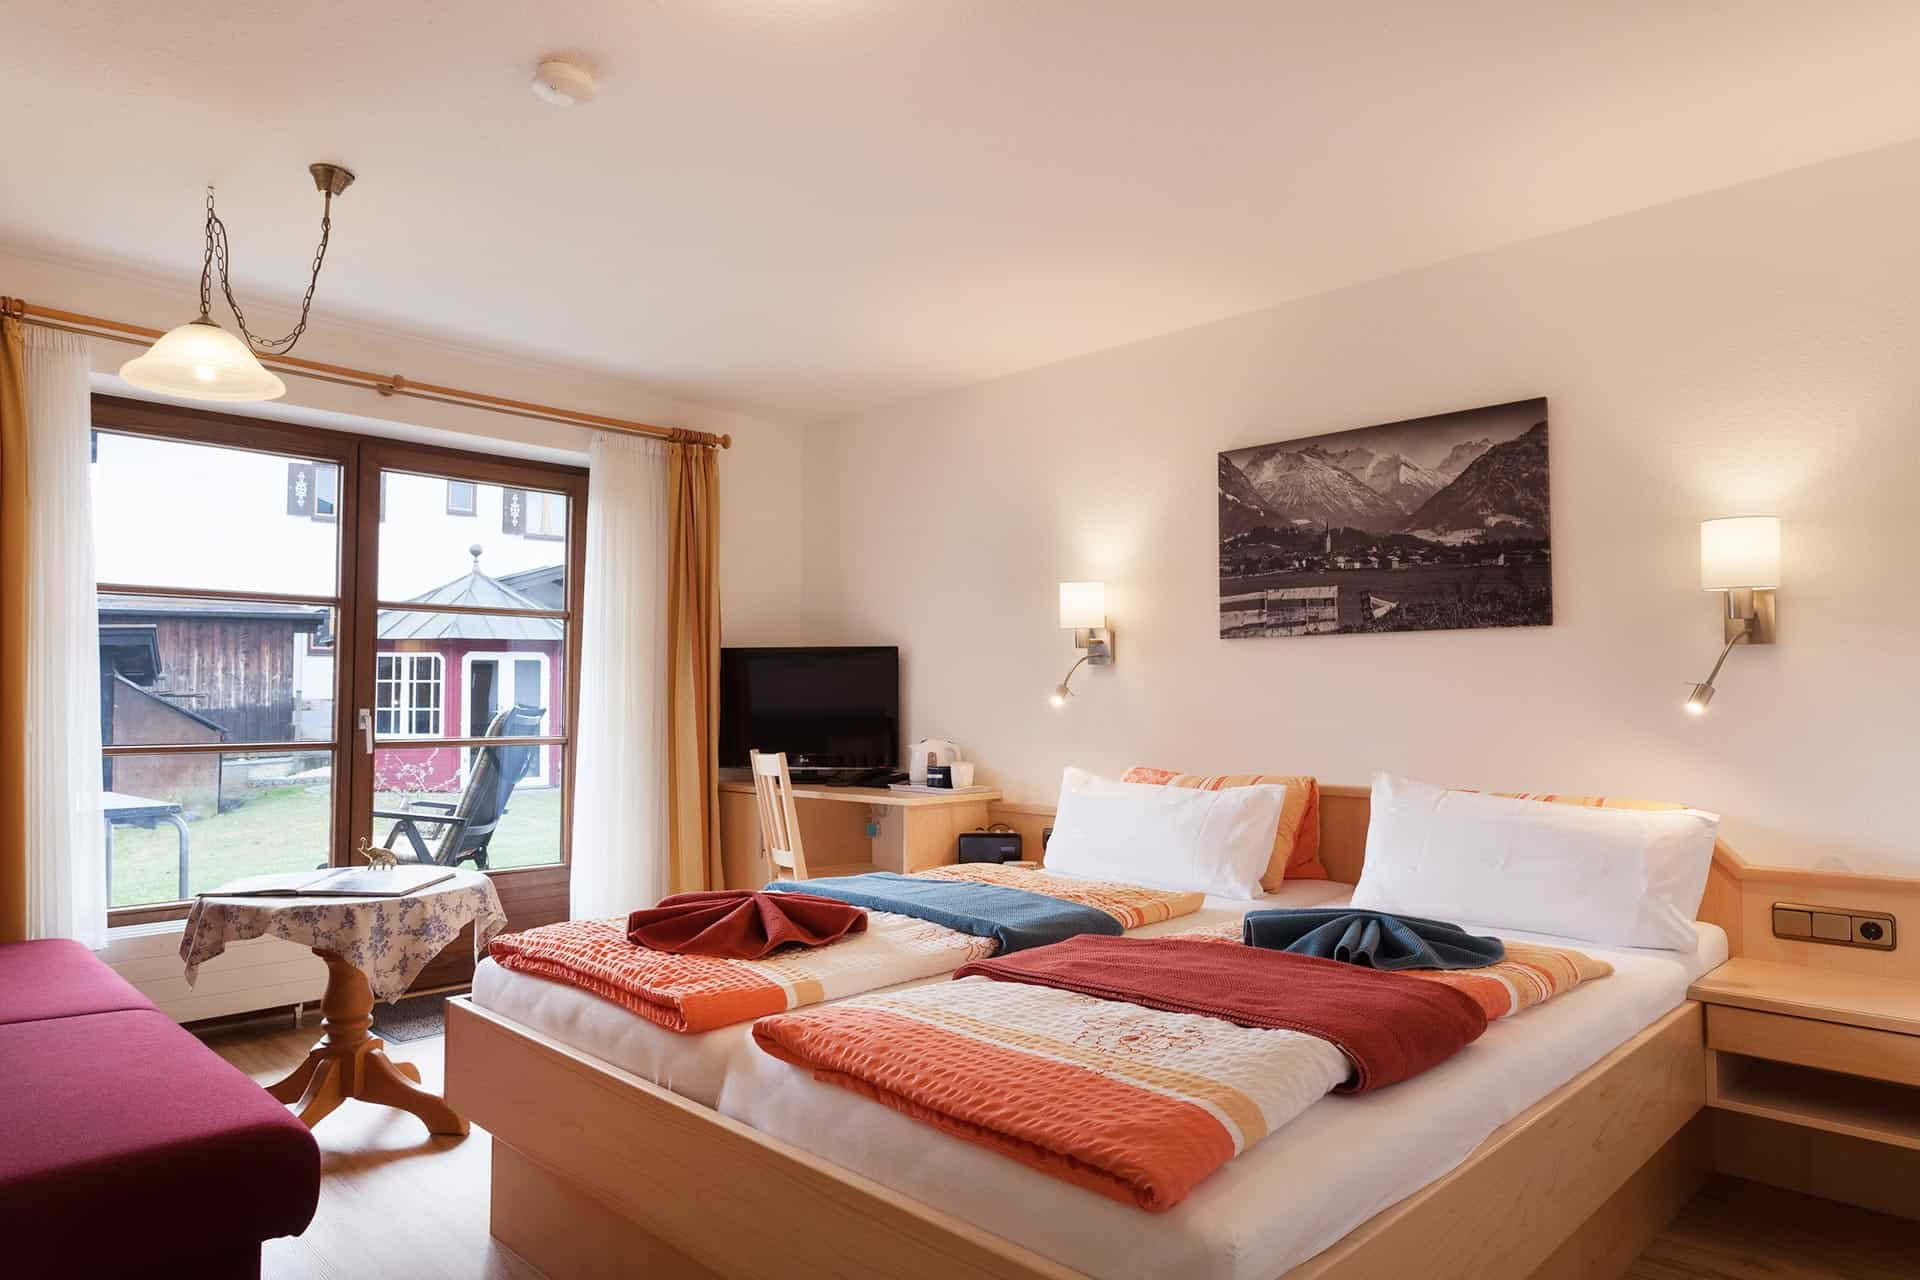 Sonnenheim Hotel Garni Doppelzimmer mit Balkon